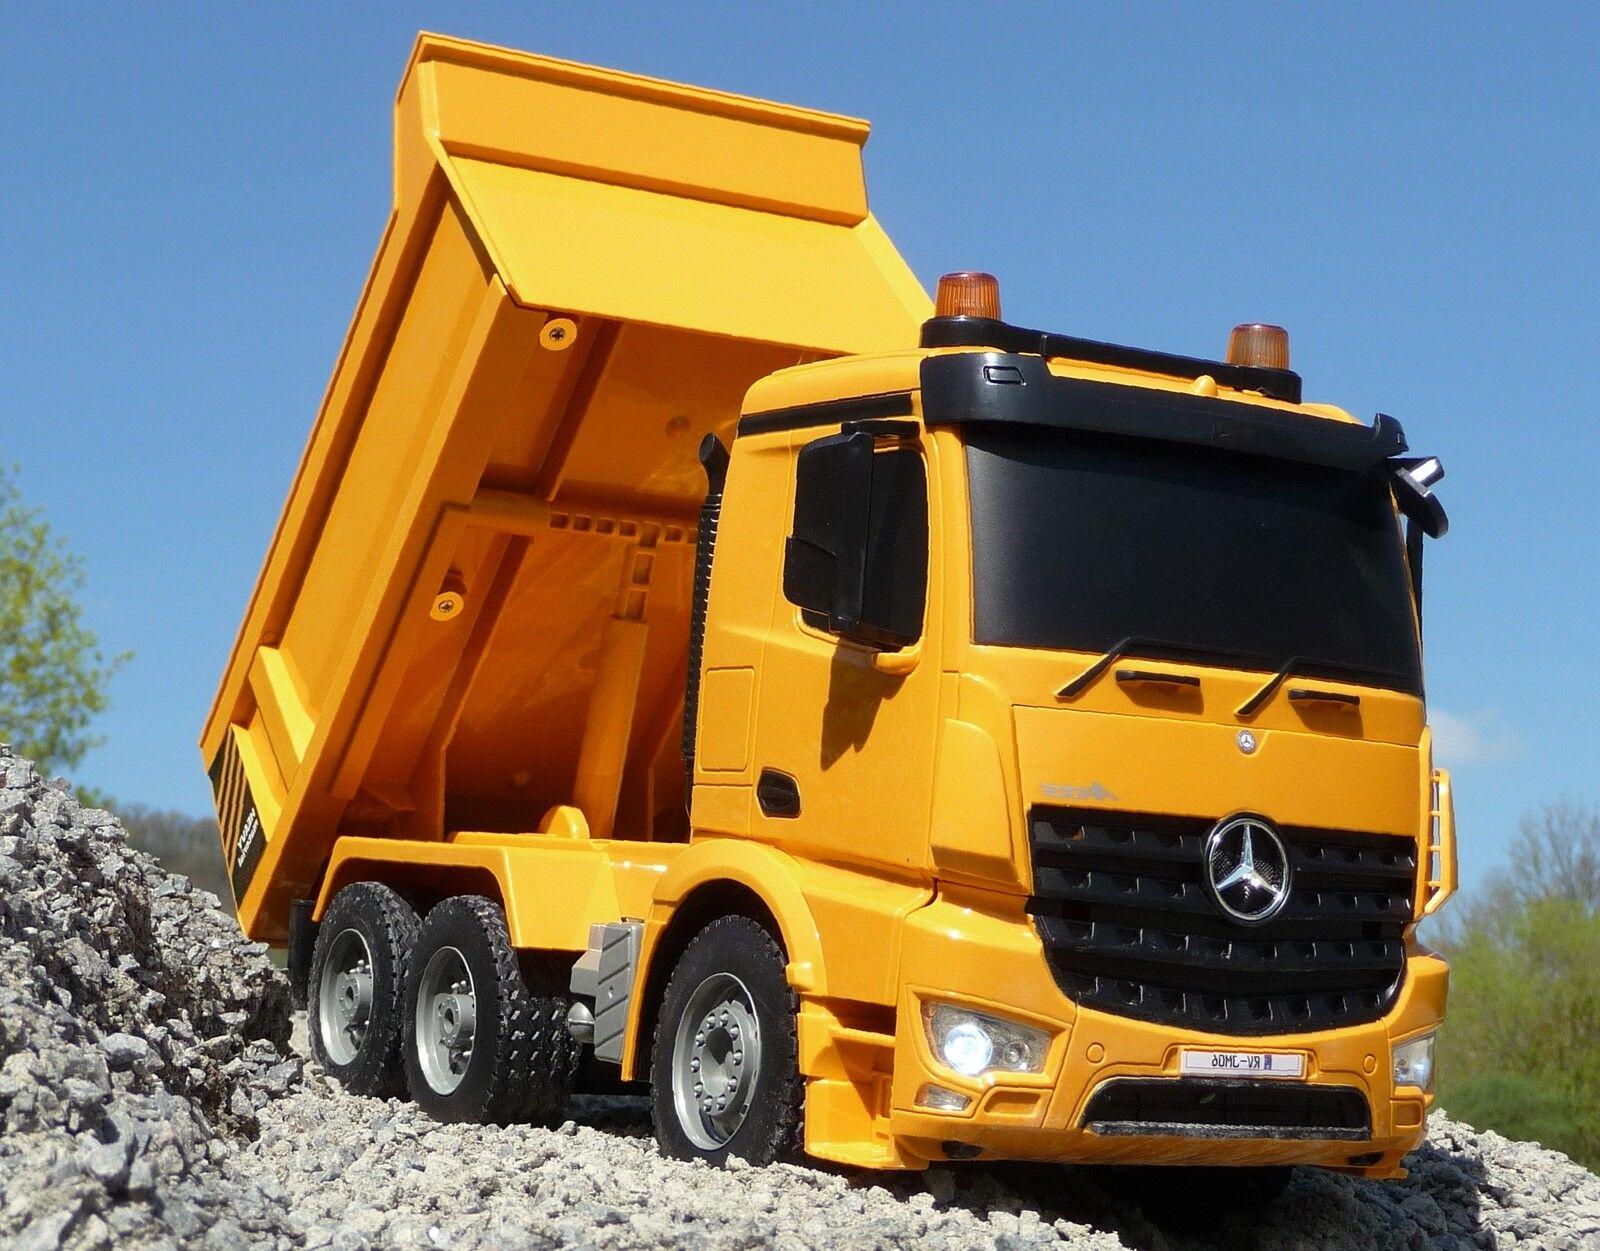 RC Camion benne MERCEDES AROCS in 1:20 lunghezza 37cm con funzione di inclinazione 404940